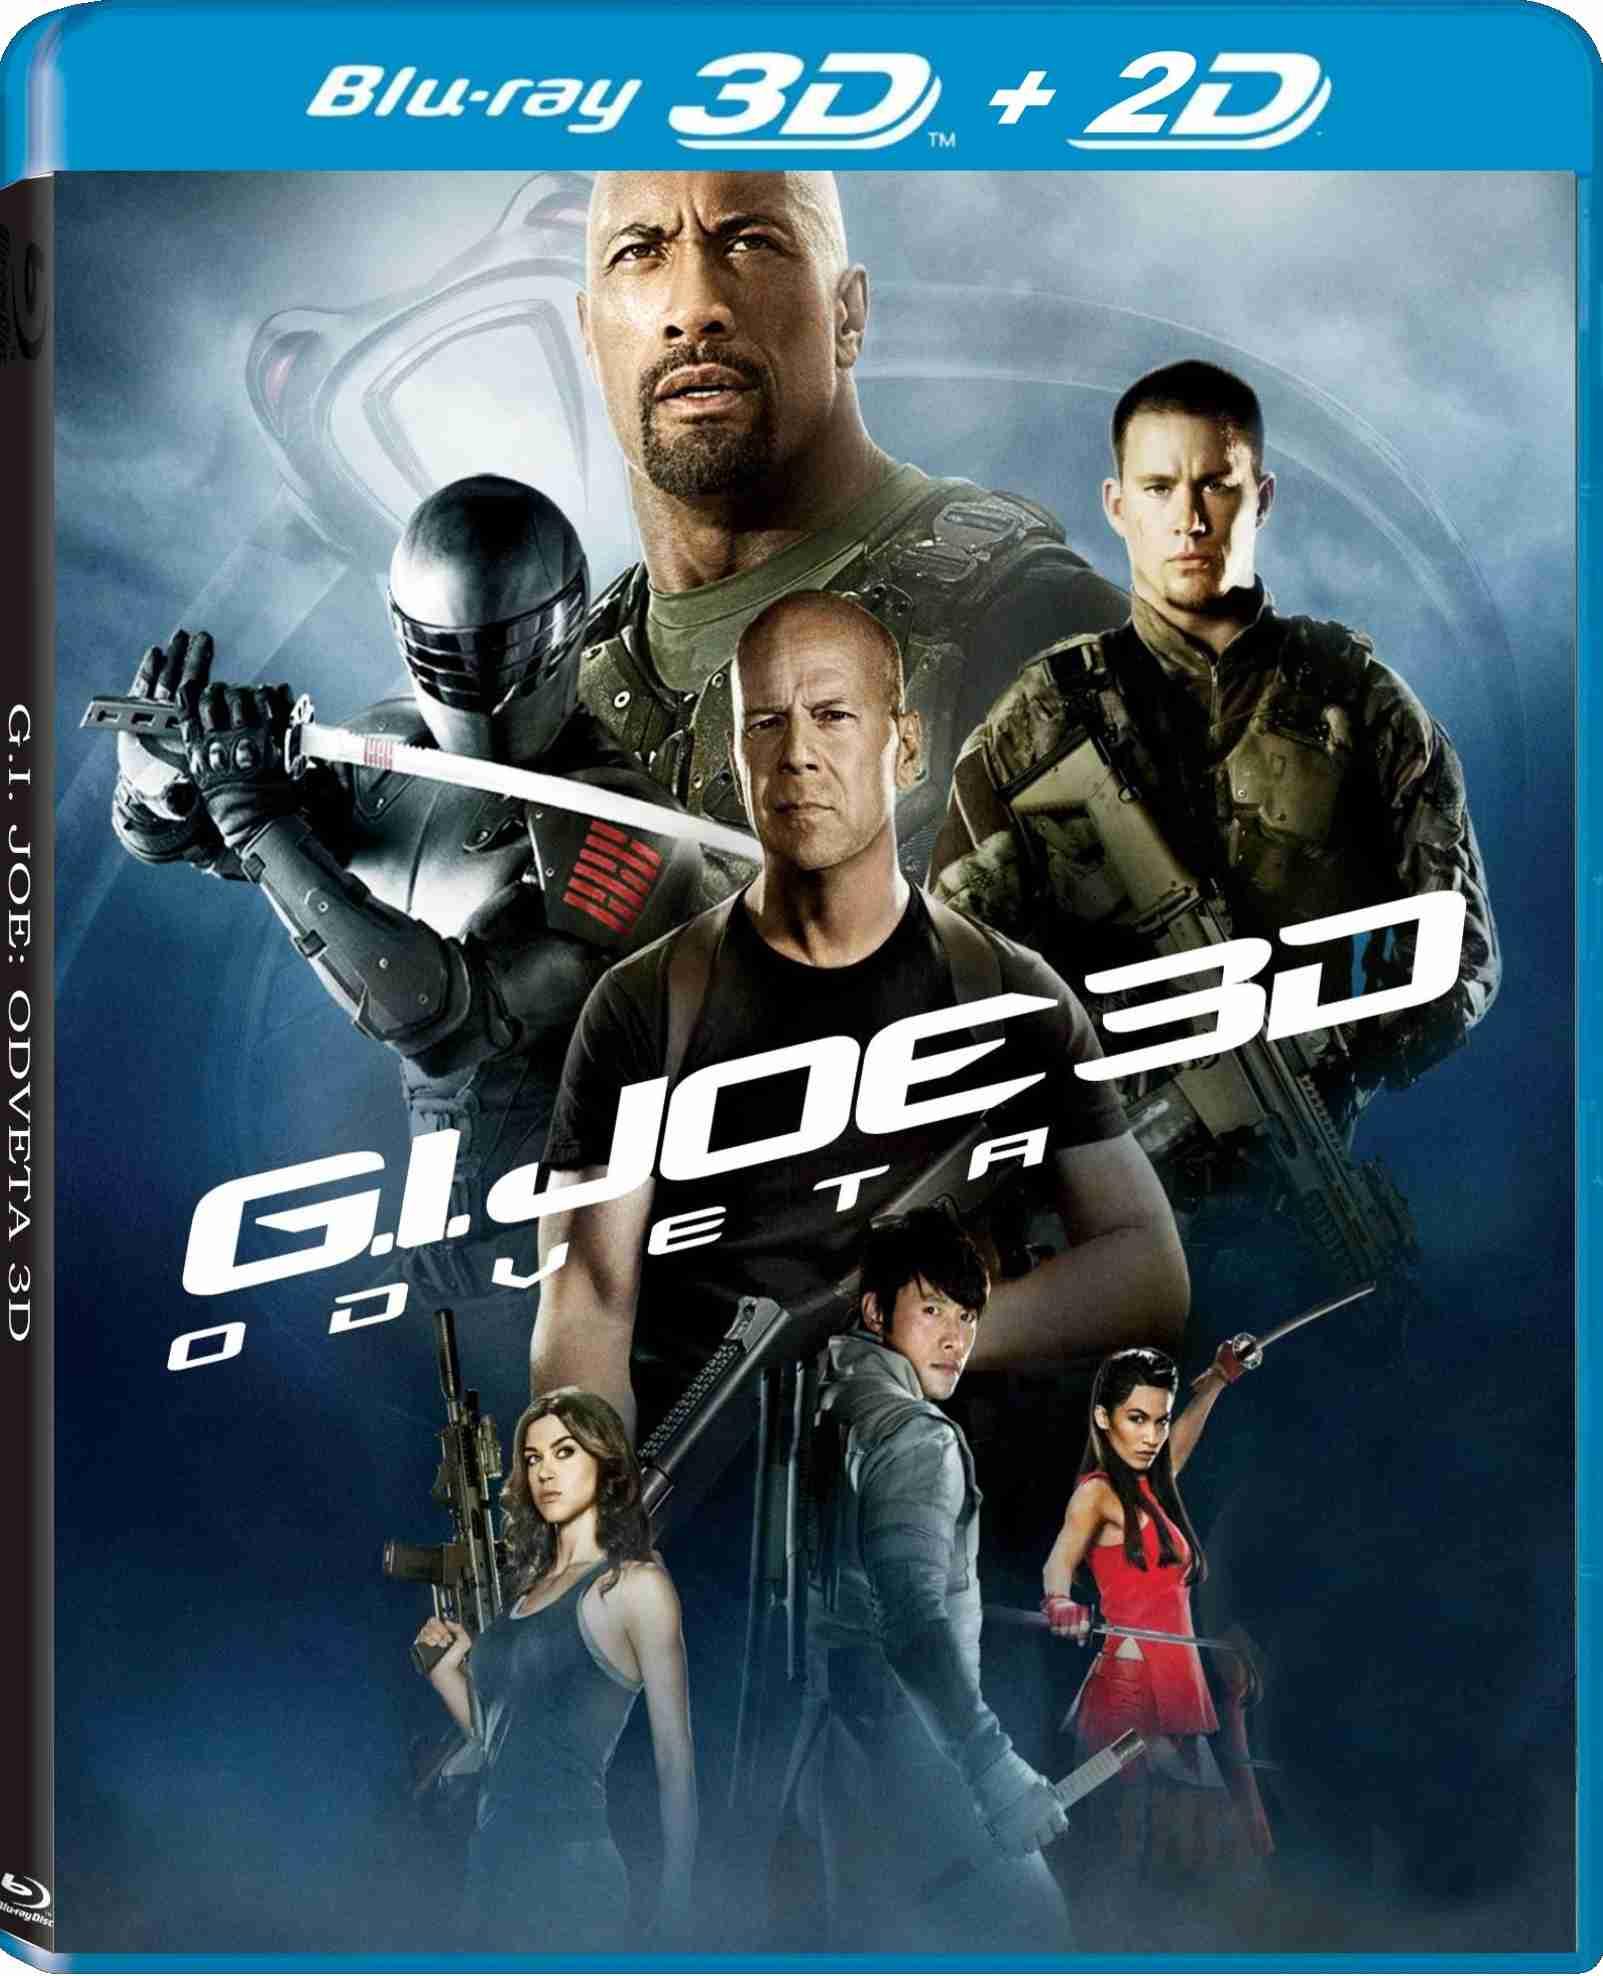 G.I. JOE 2: ODVETA - Blu-ray 3D + 2D